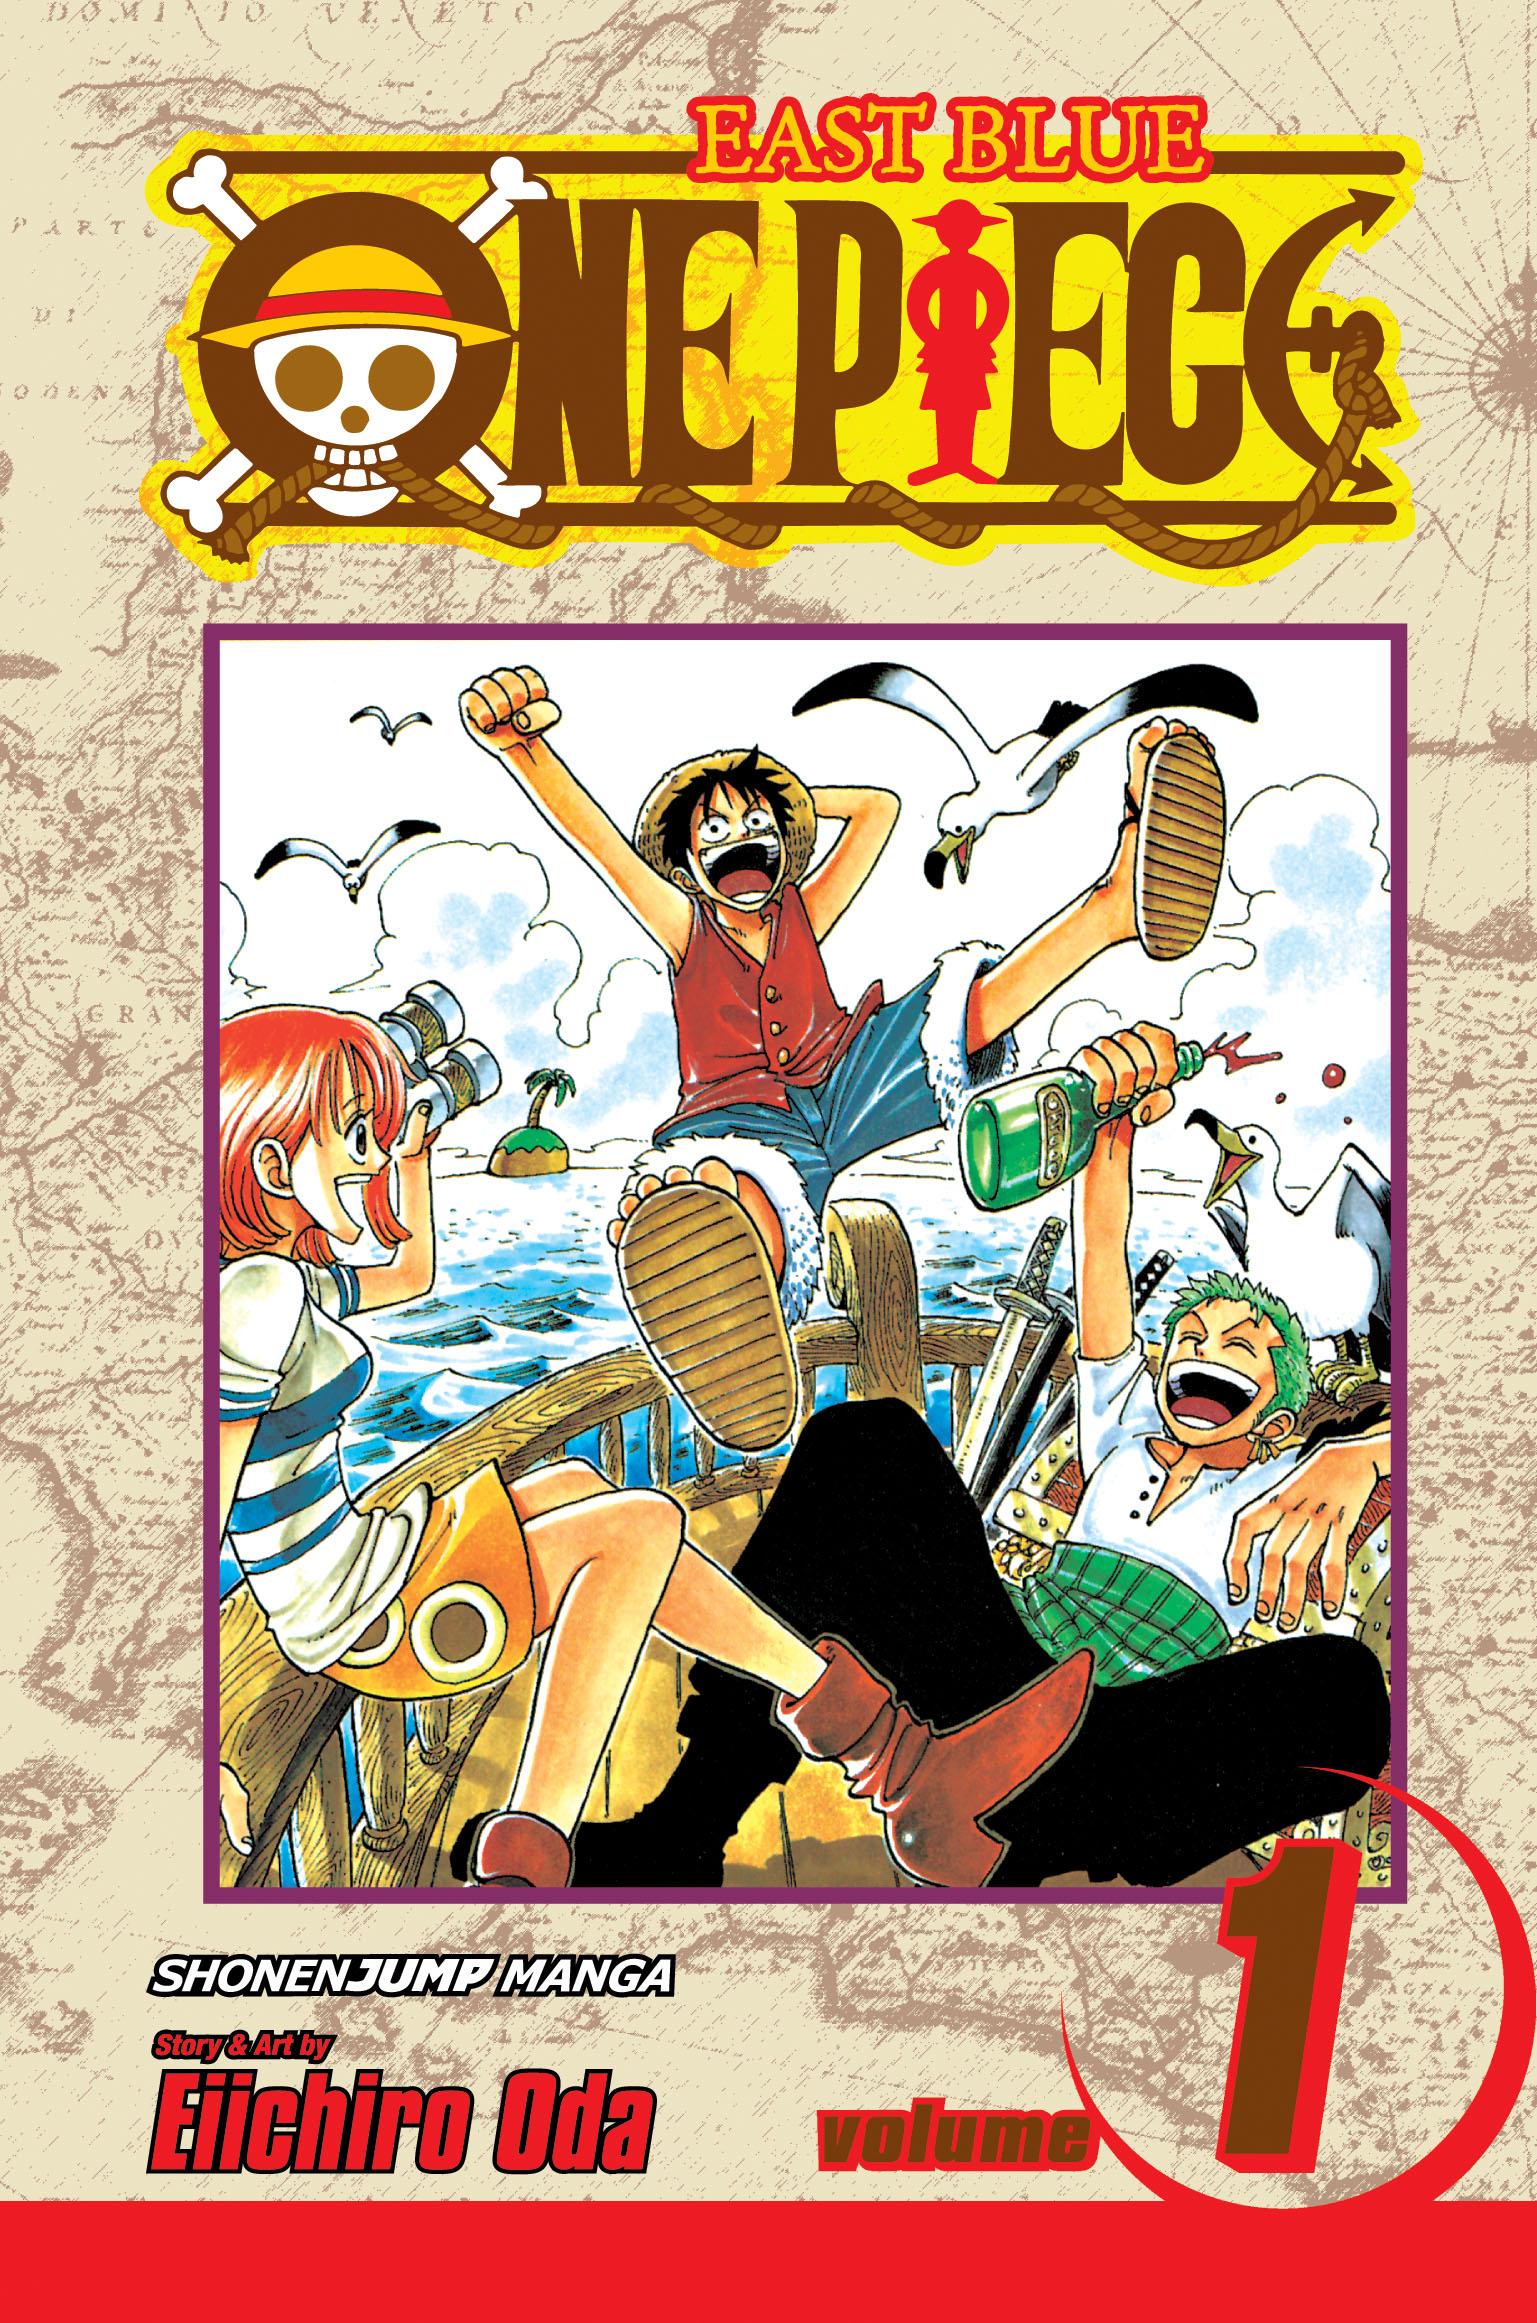 One Piece, Vol. 1   Book by Eiichiro Oda   Official ...